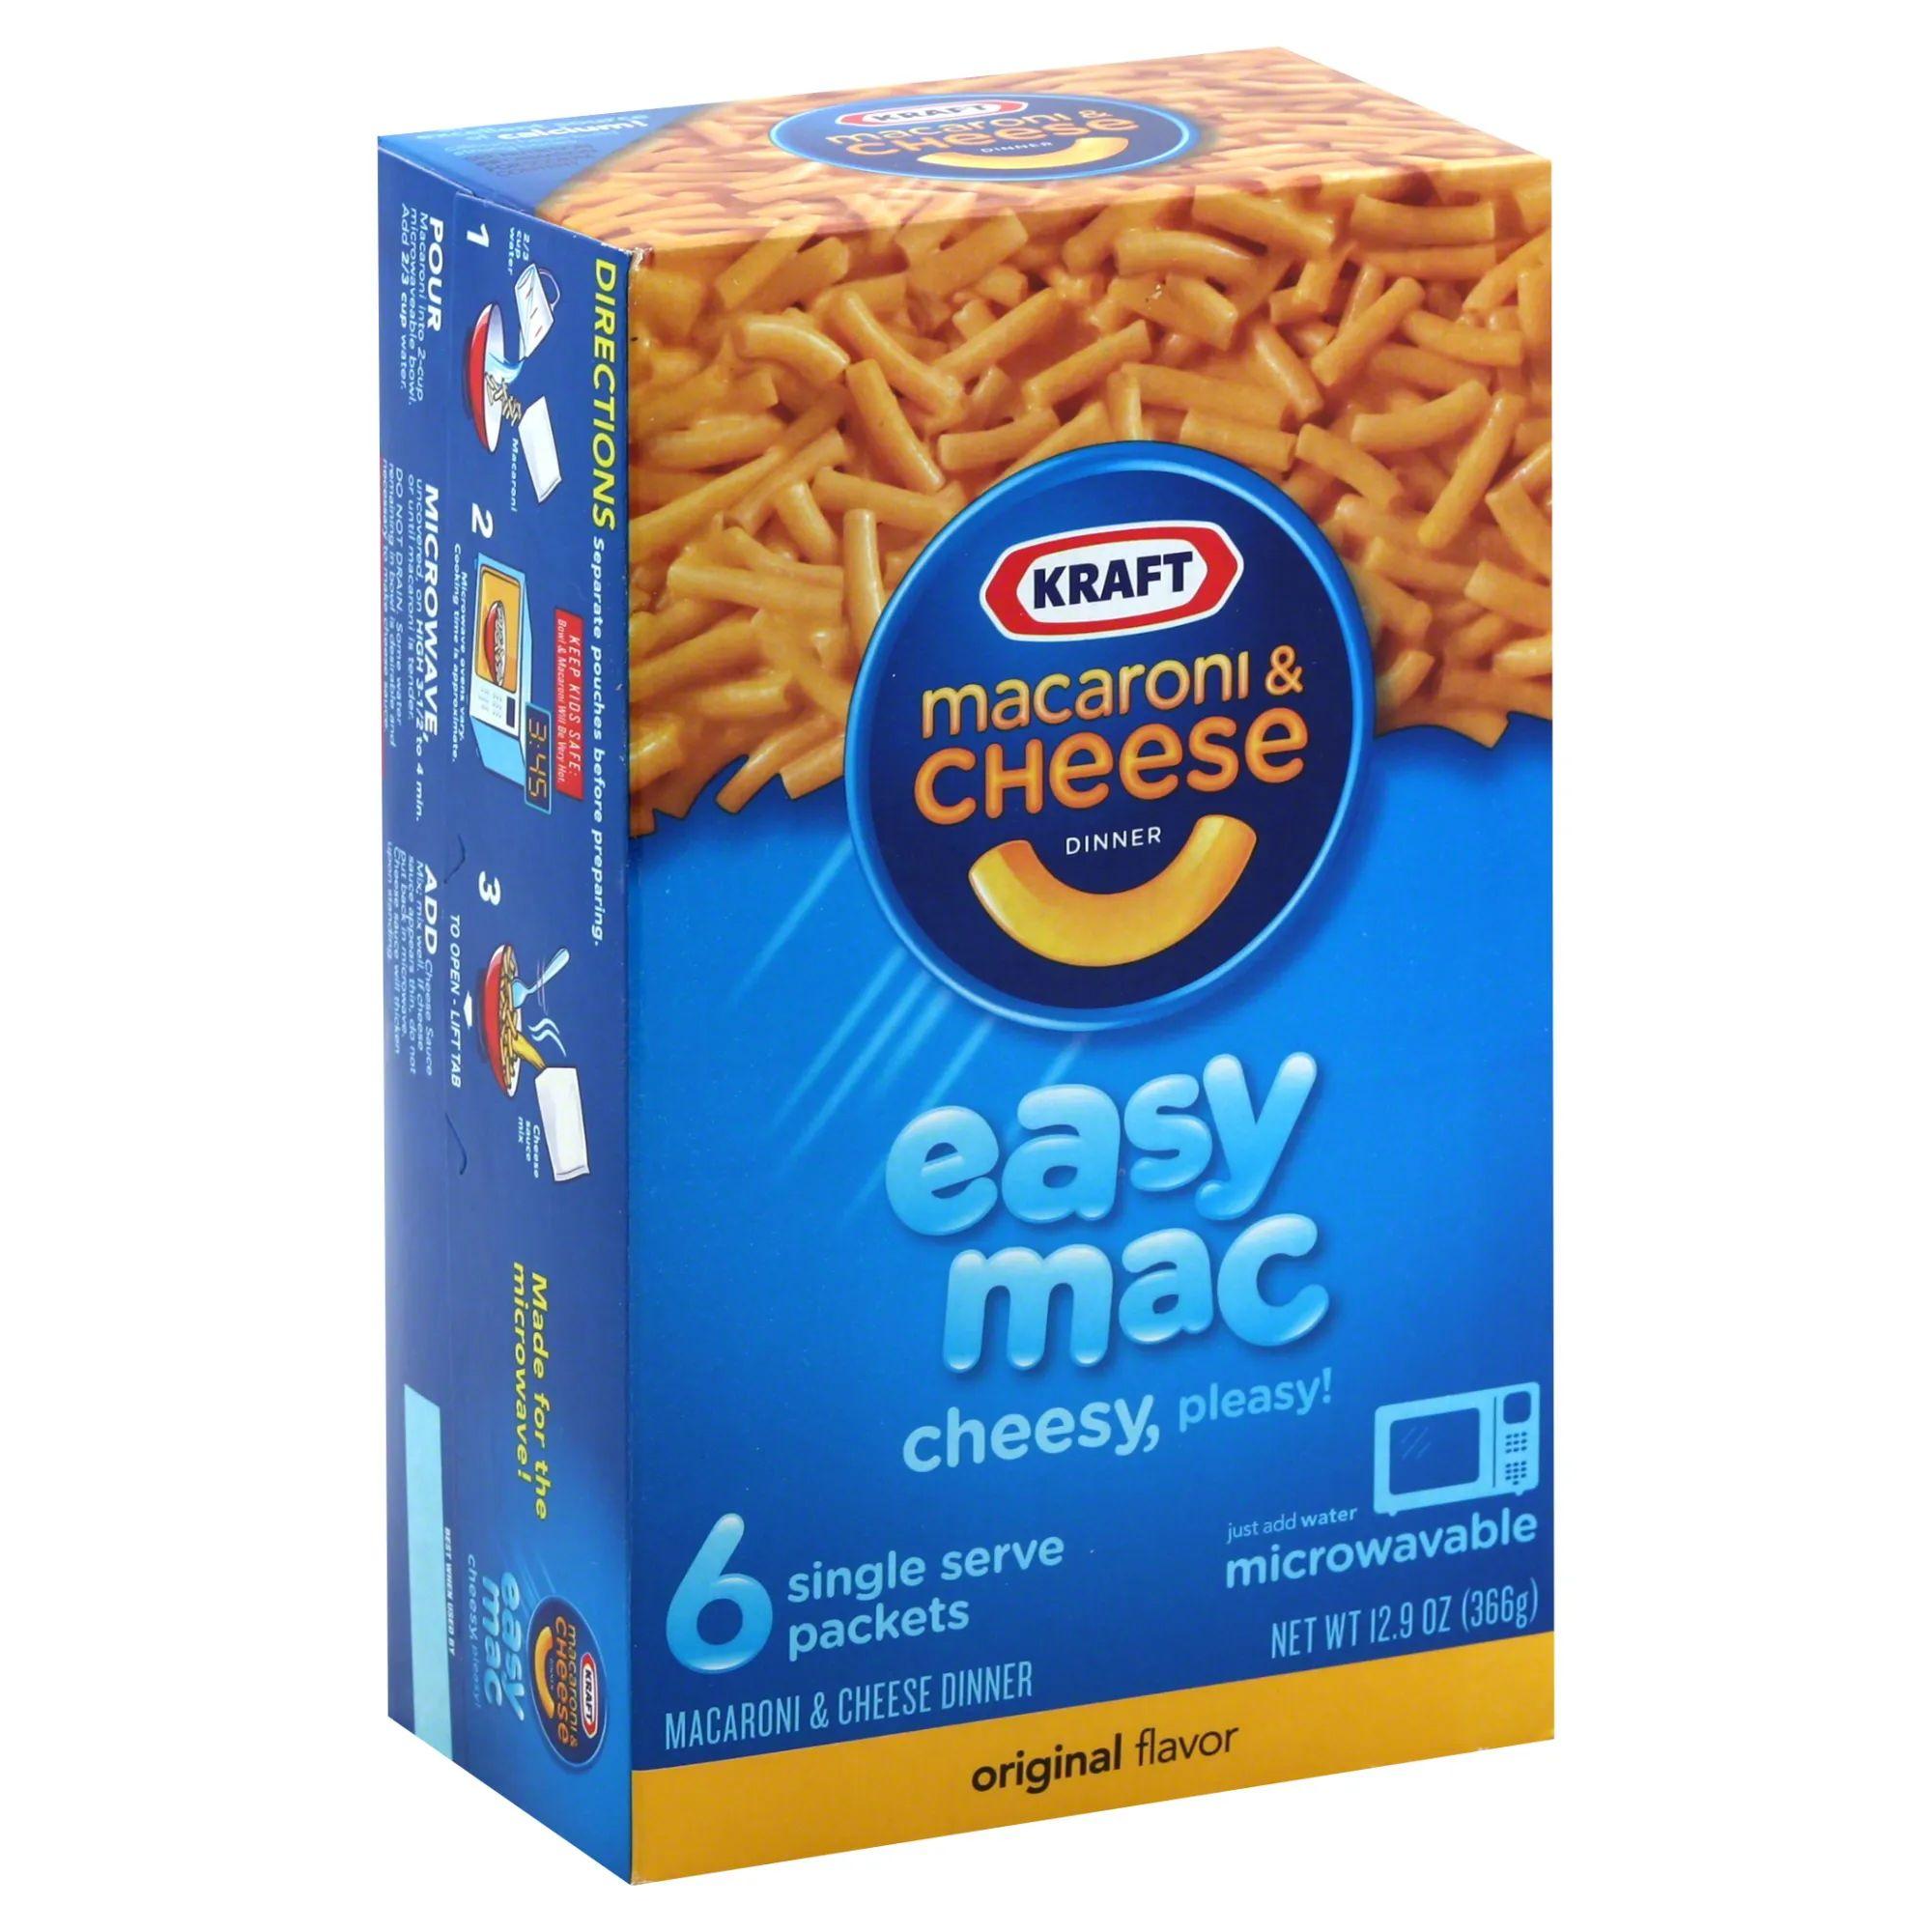 Kraft Macaroni And Cheese Dinner Original Flavor 6 Packets 12 9 Oz 366 G Rite Aid